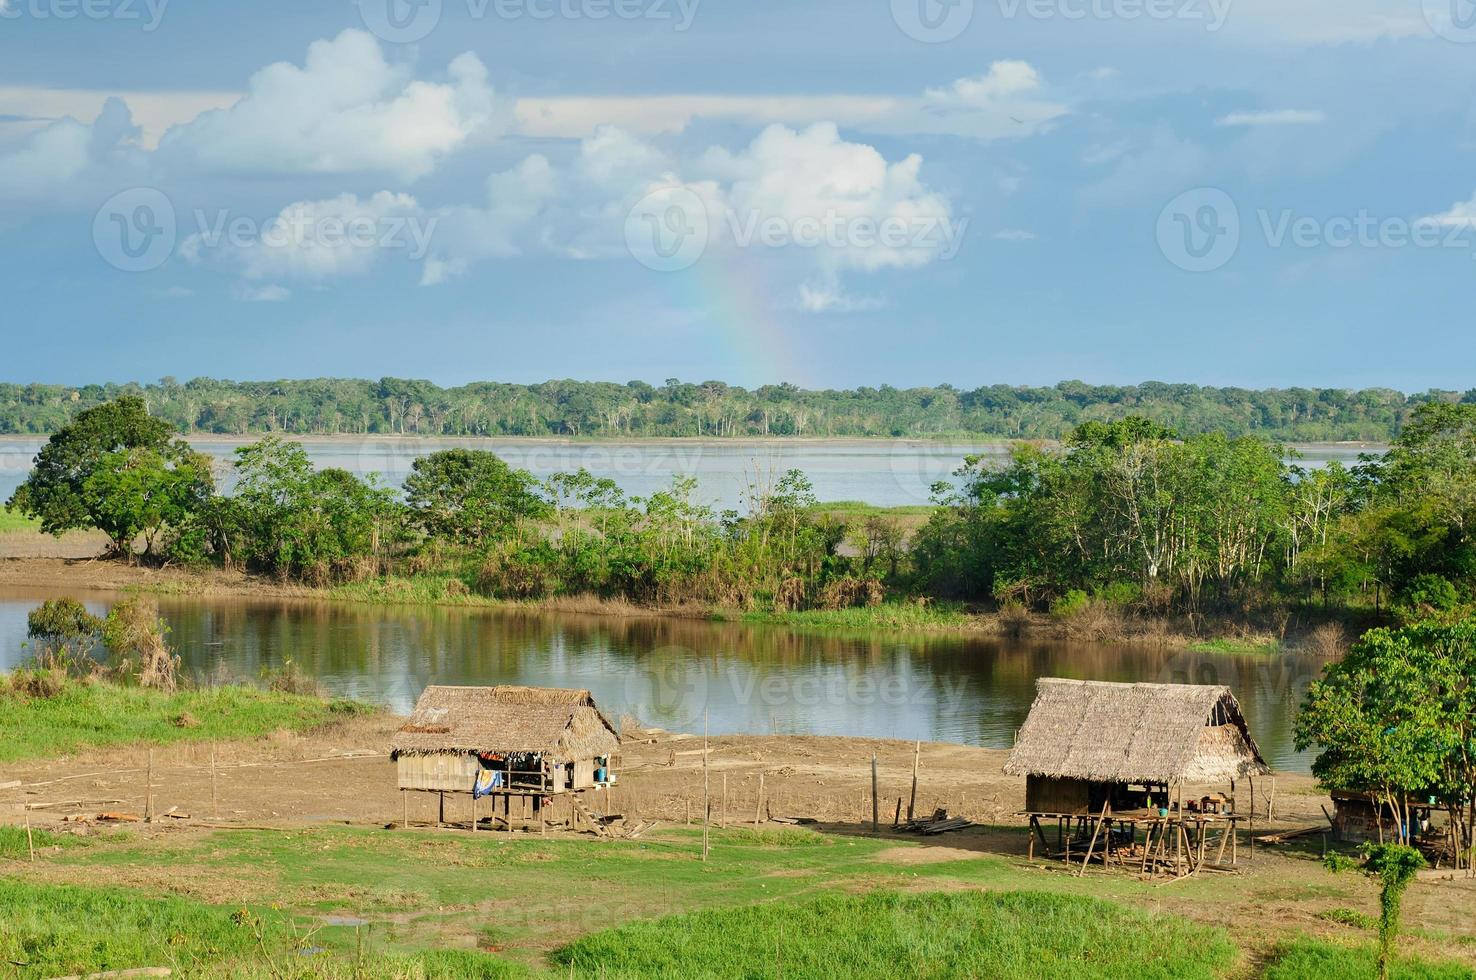 tribos indígenas da amazônia no brasil foto